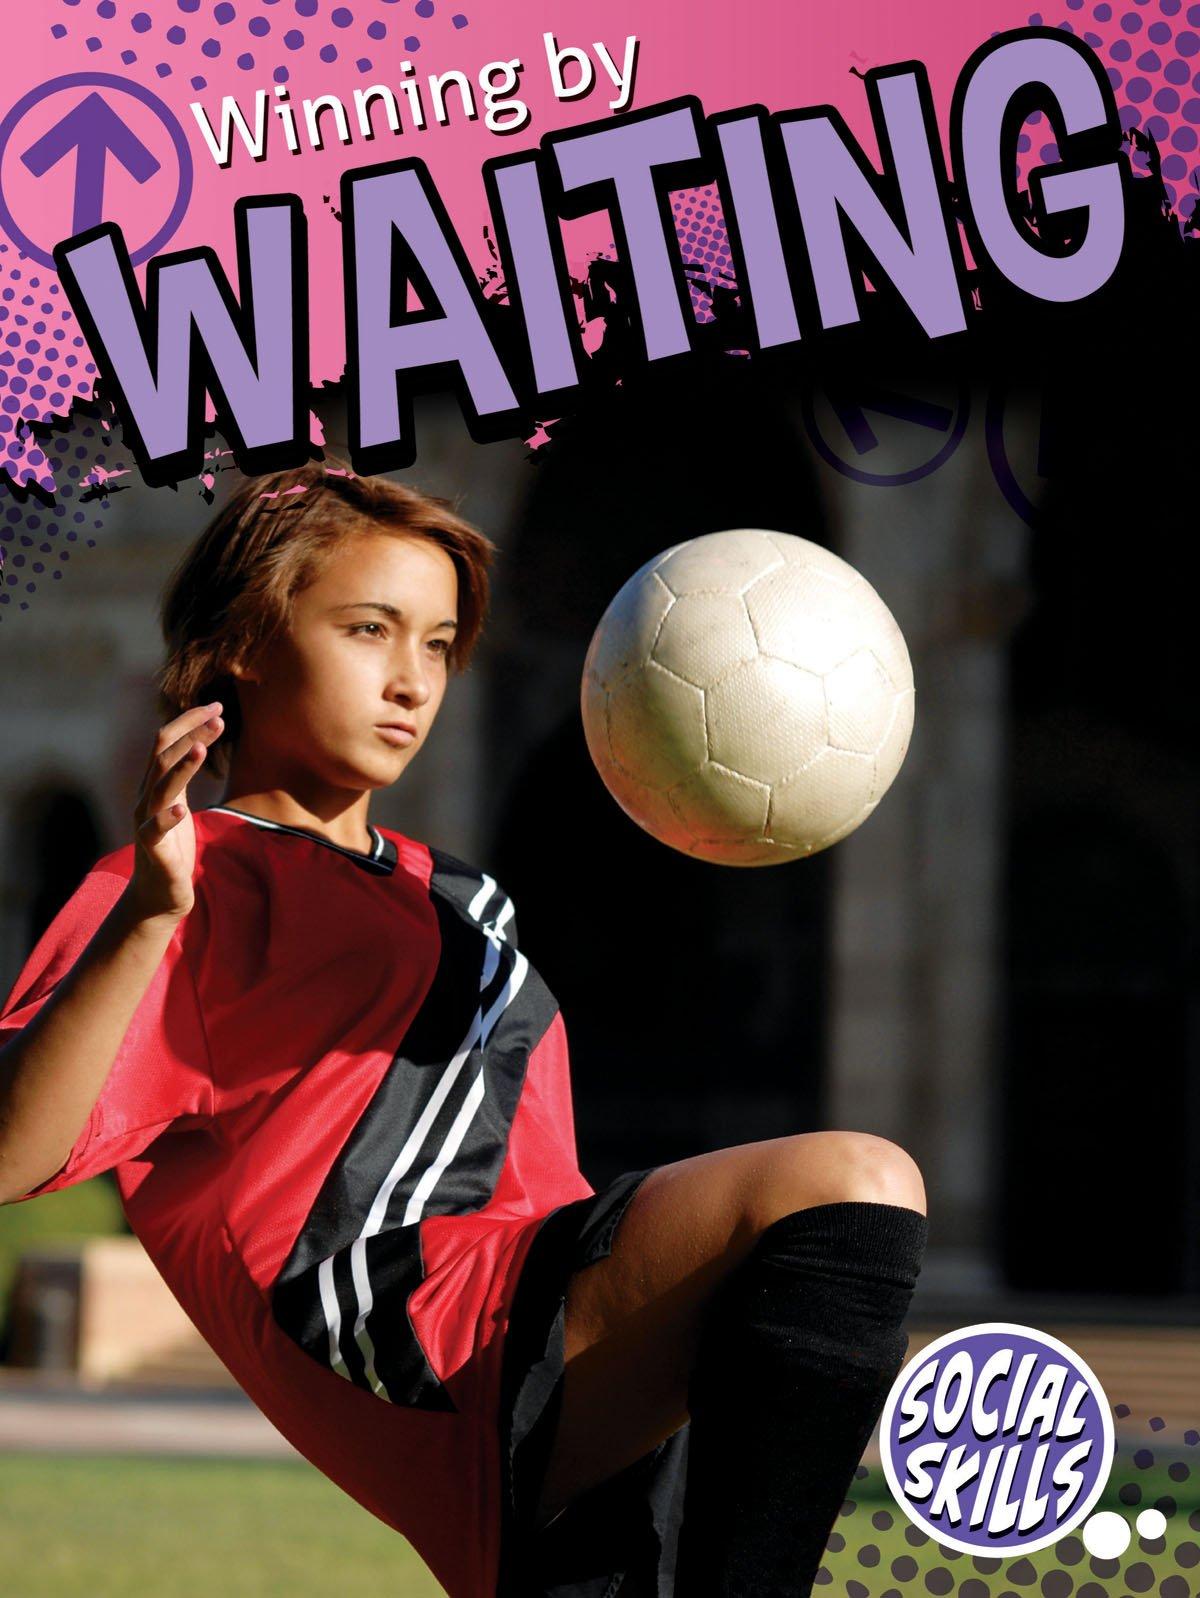 Winning By Waiting (Social Skills) pdf